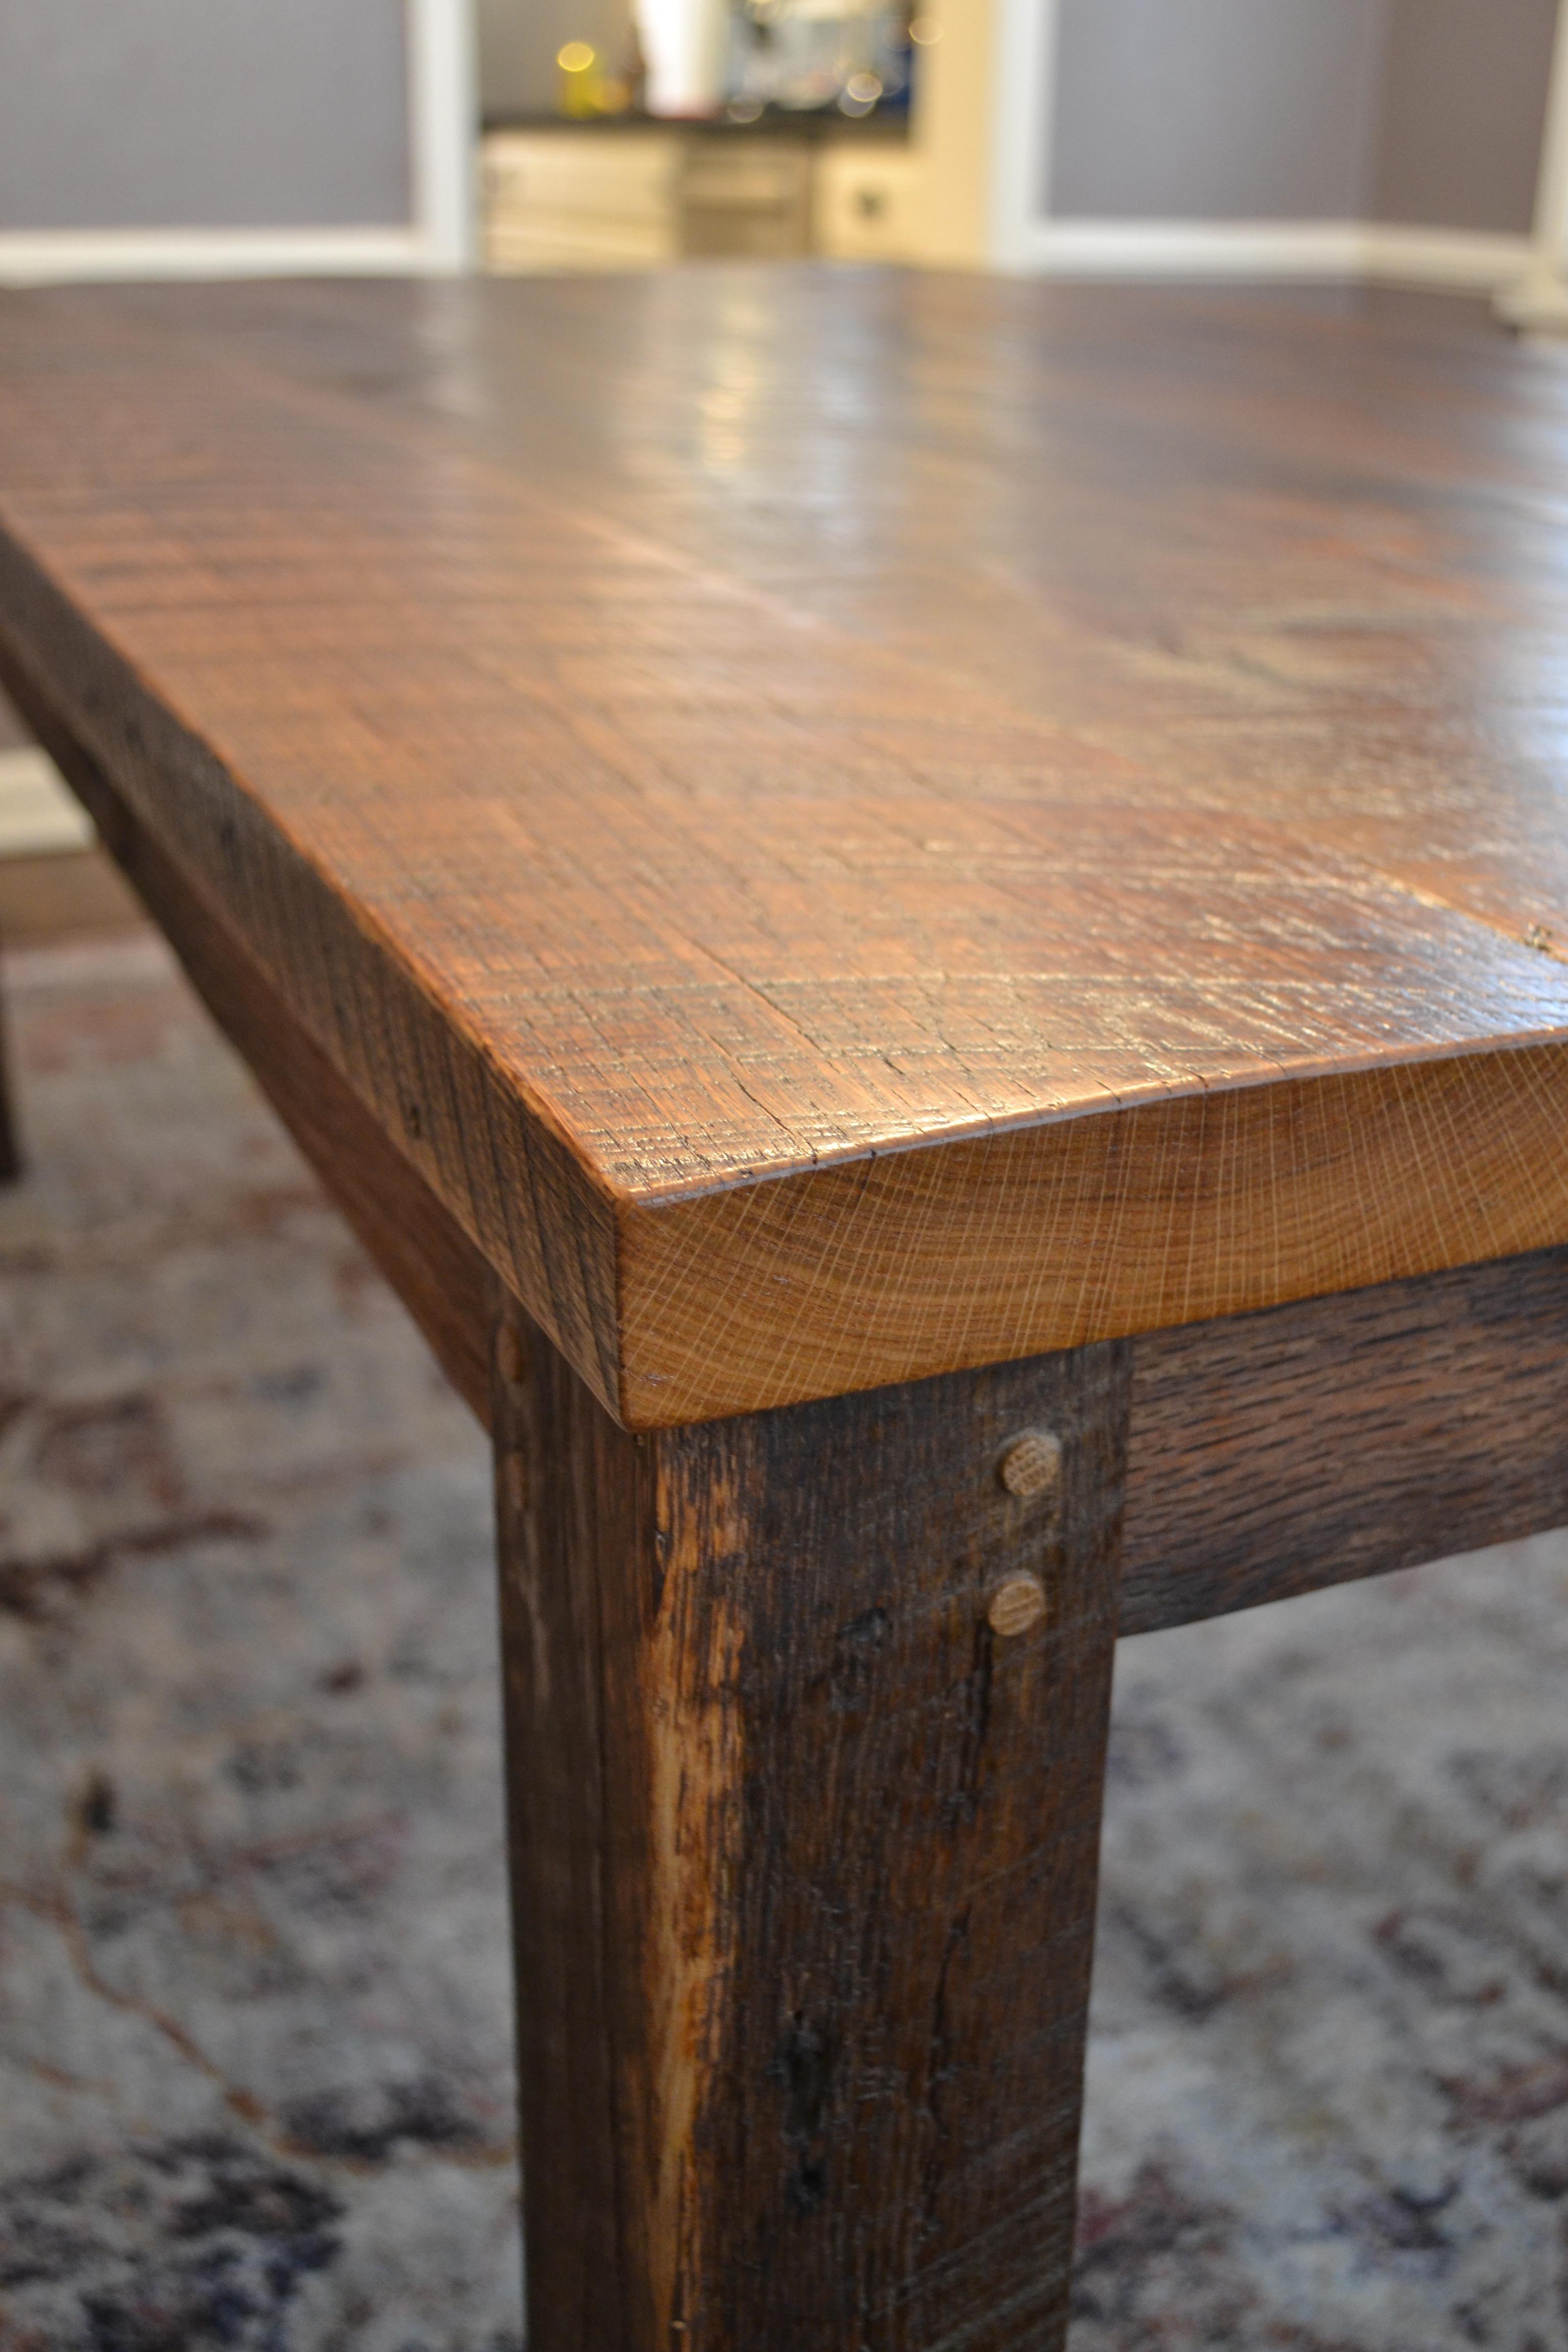 The Daniel Table